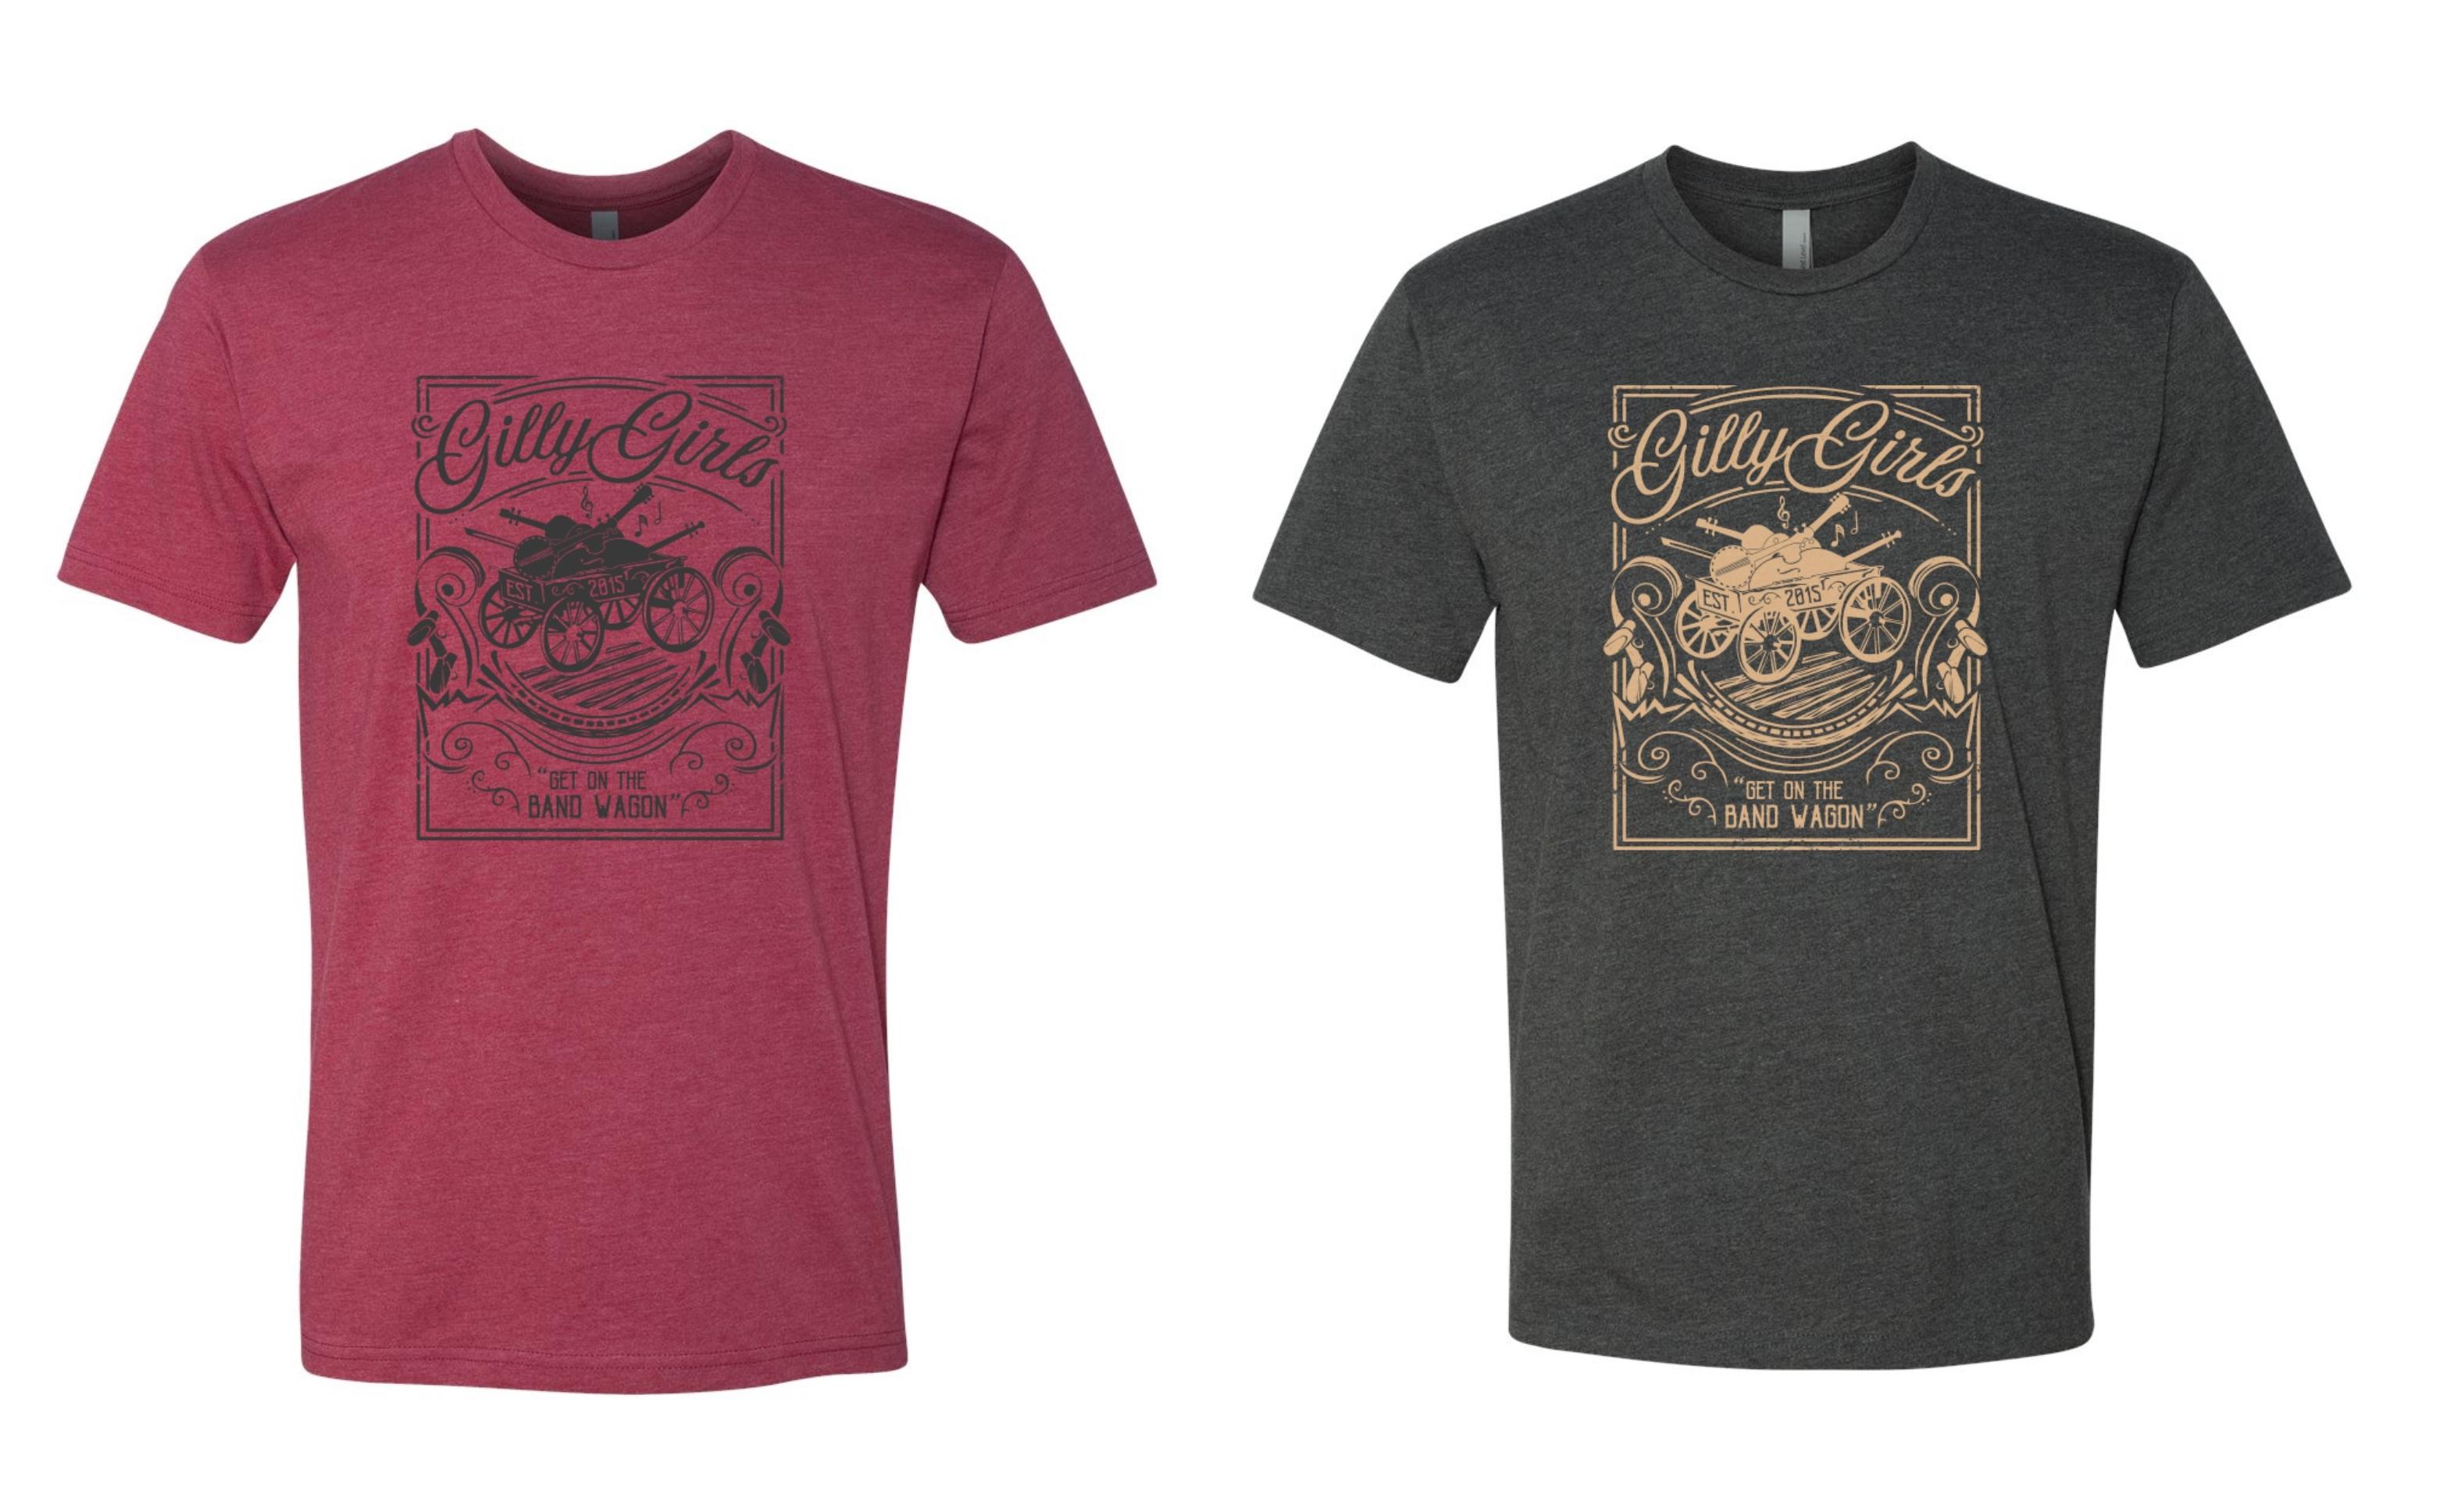 Get on the Band Wagon T-shirt 00002